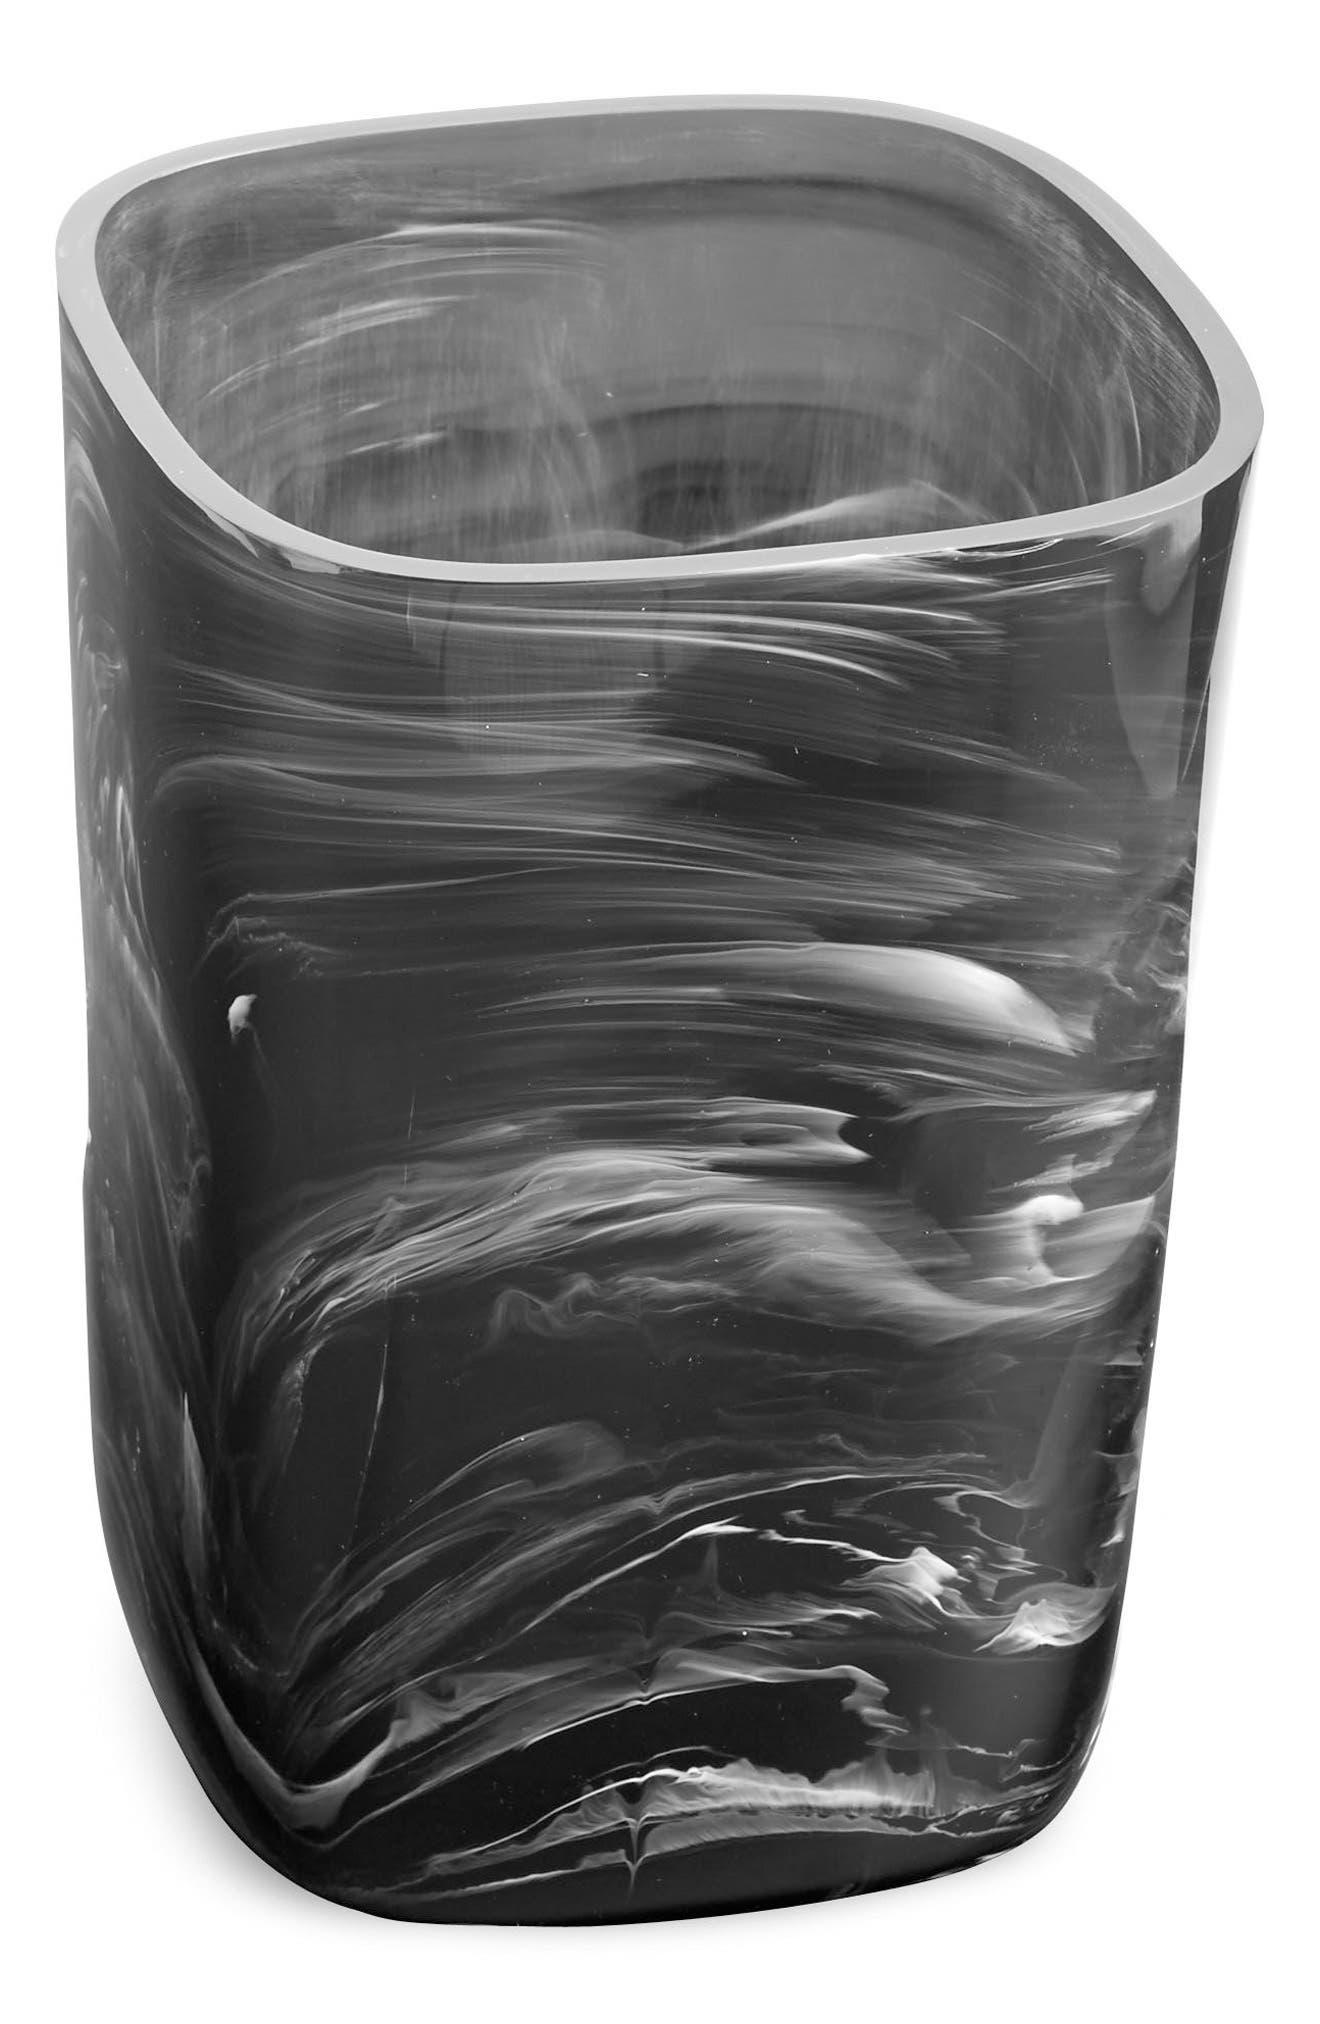 Alternate Image 1 Selected - Paradigm Trends Murano Wastebasket